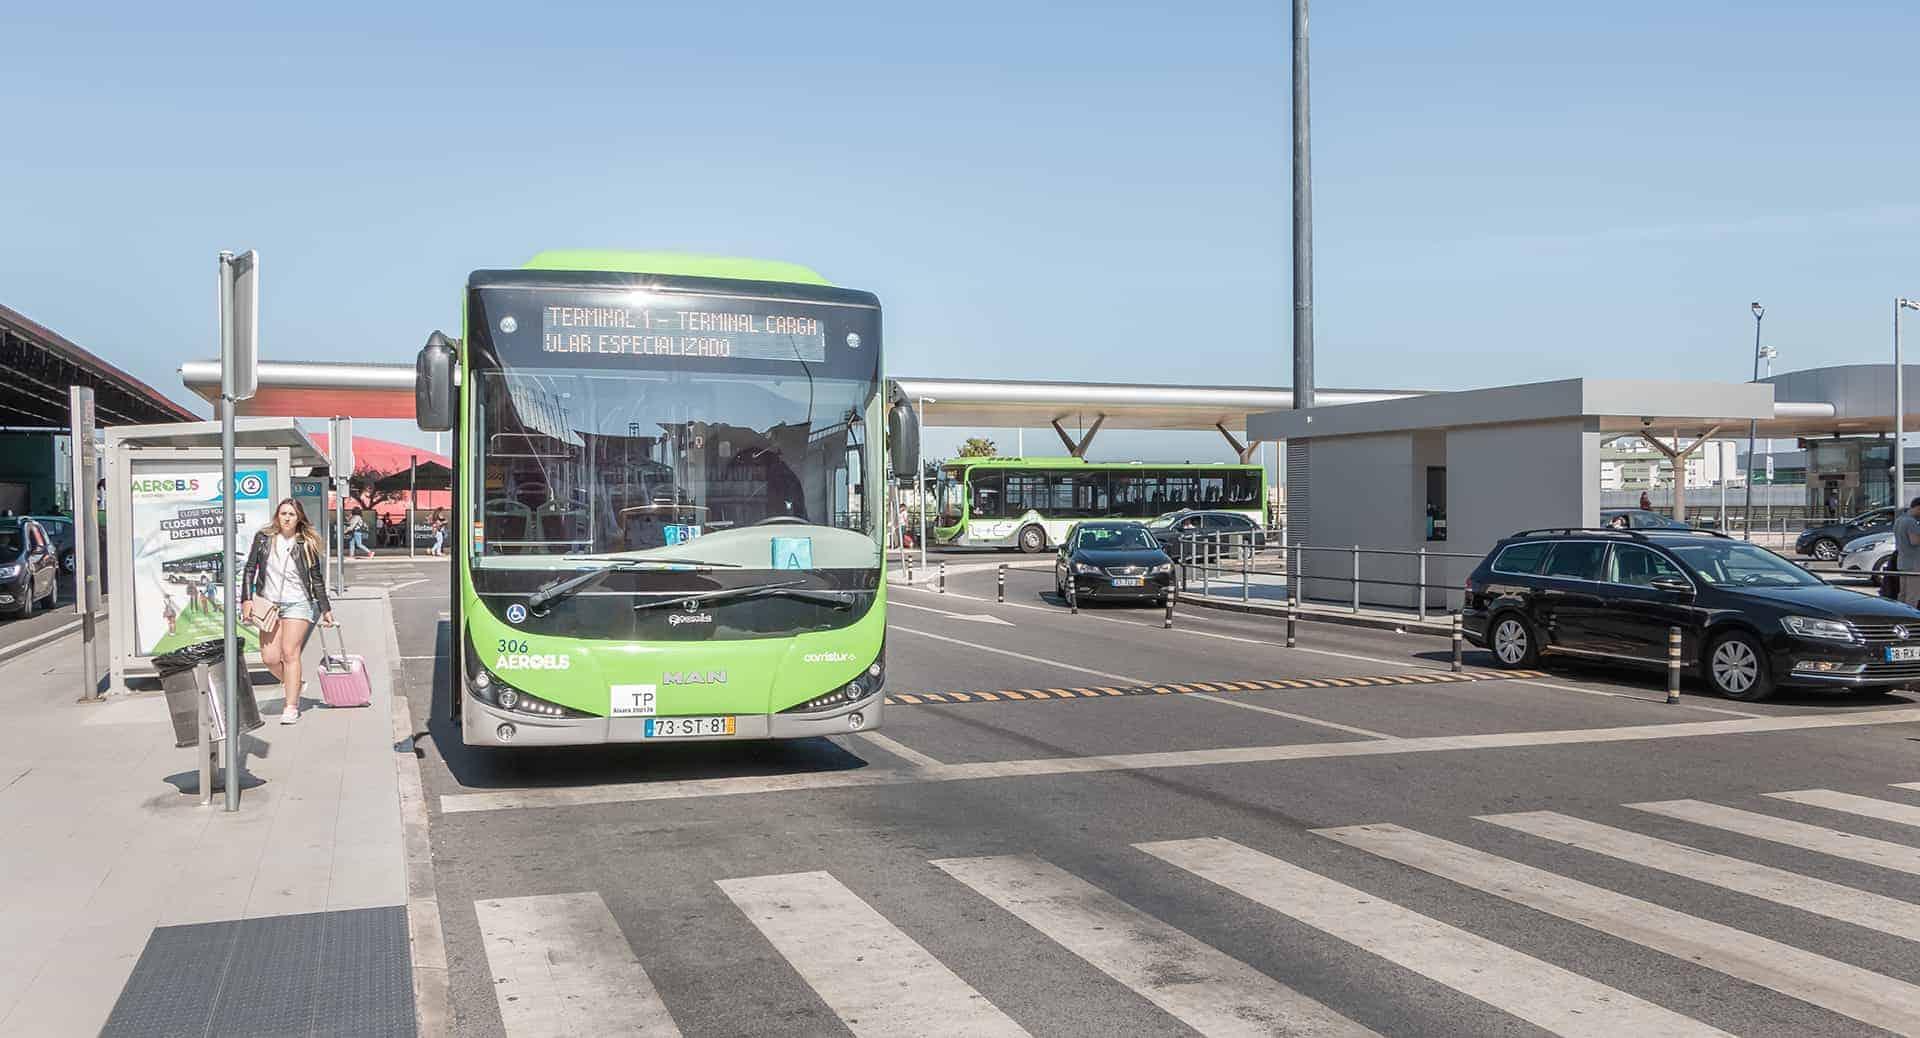 aerobus transport lisbonne